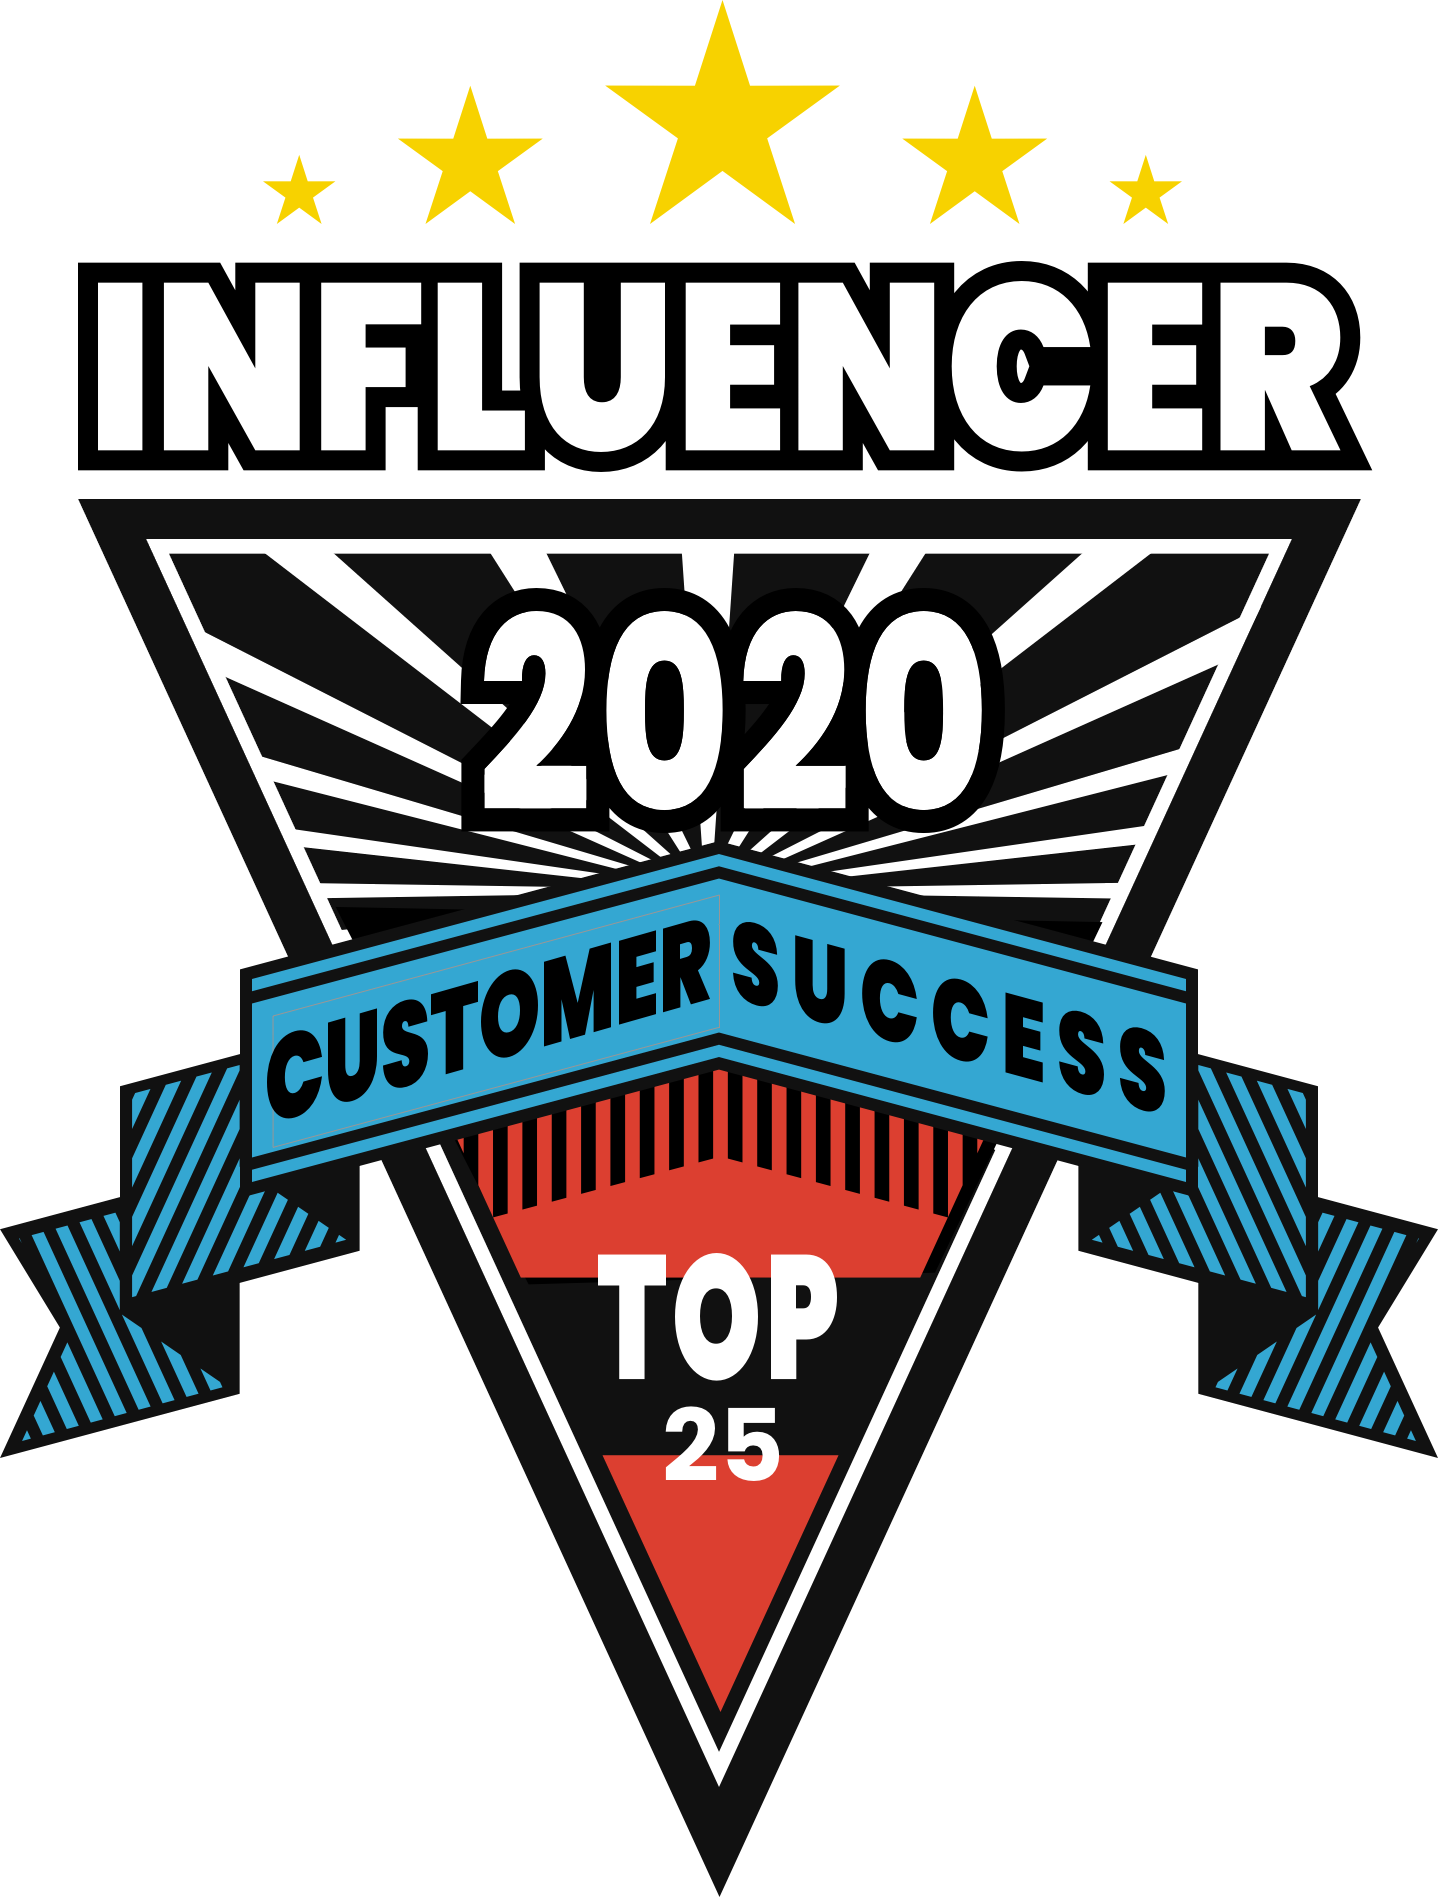 Customer Success Top Influencer